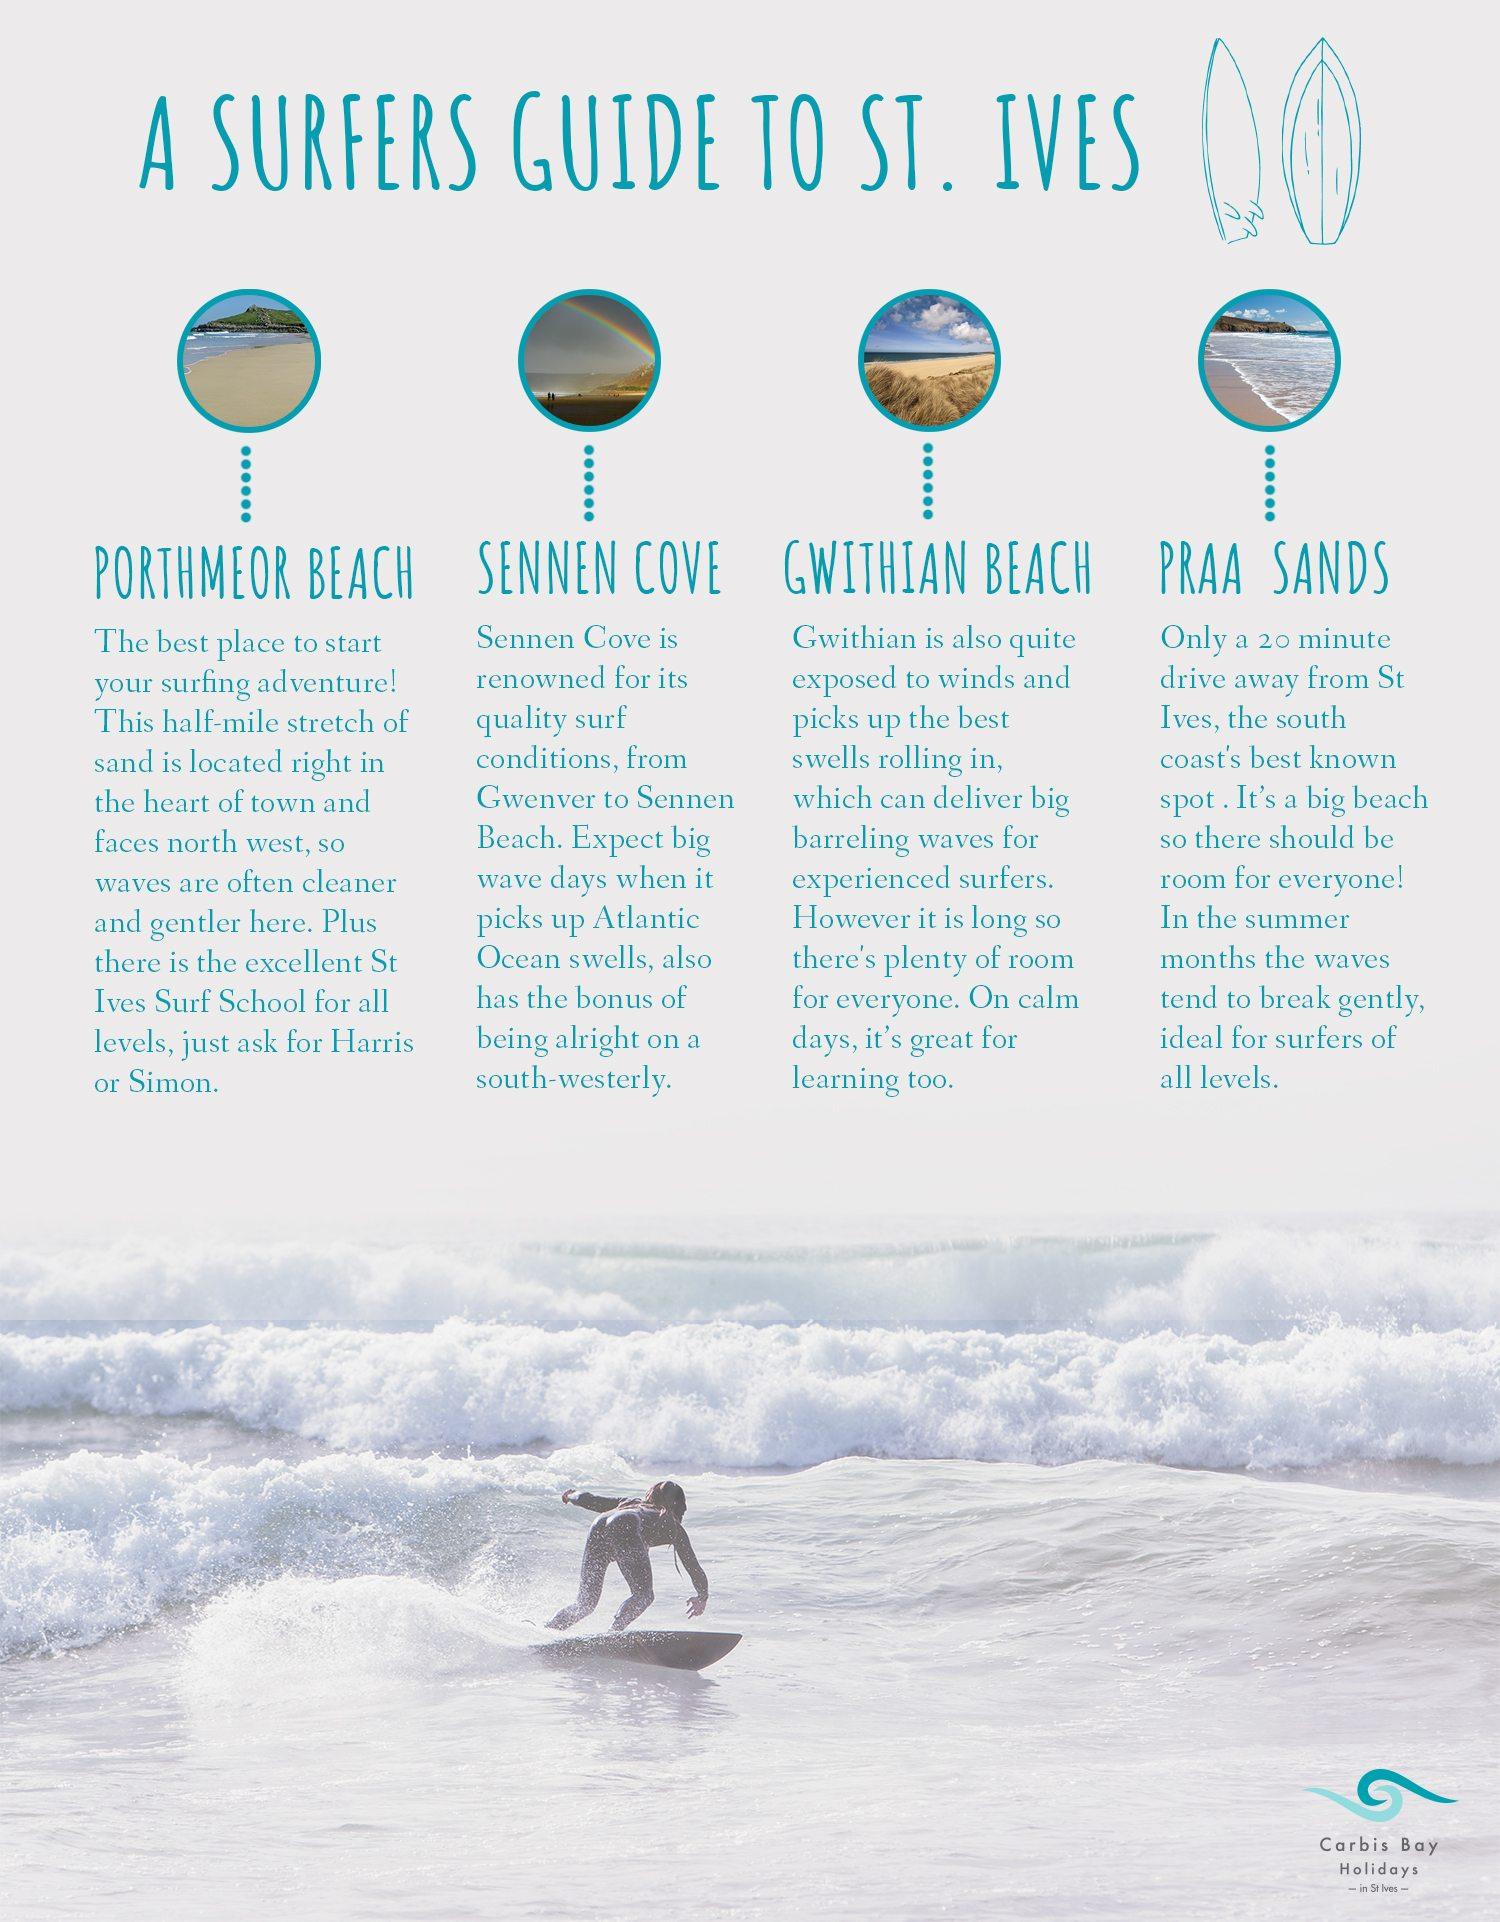 St Ives Surf Spots